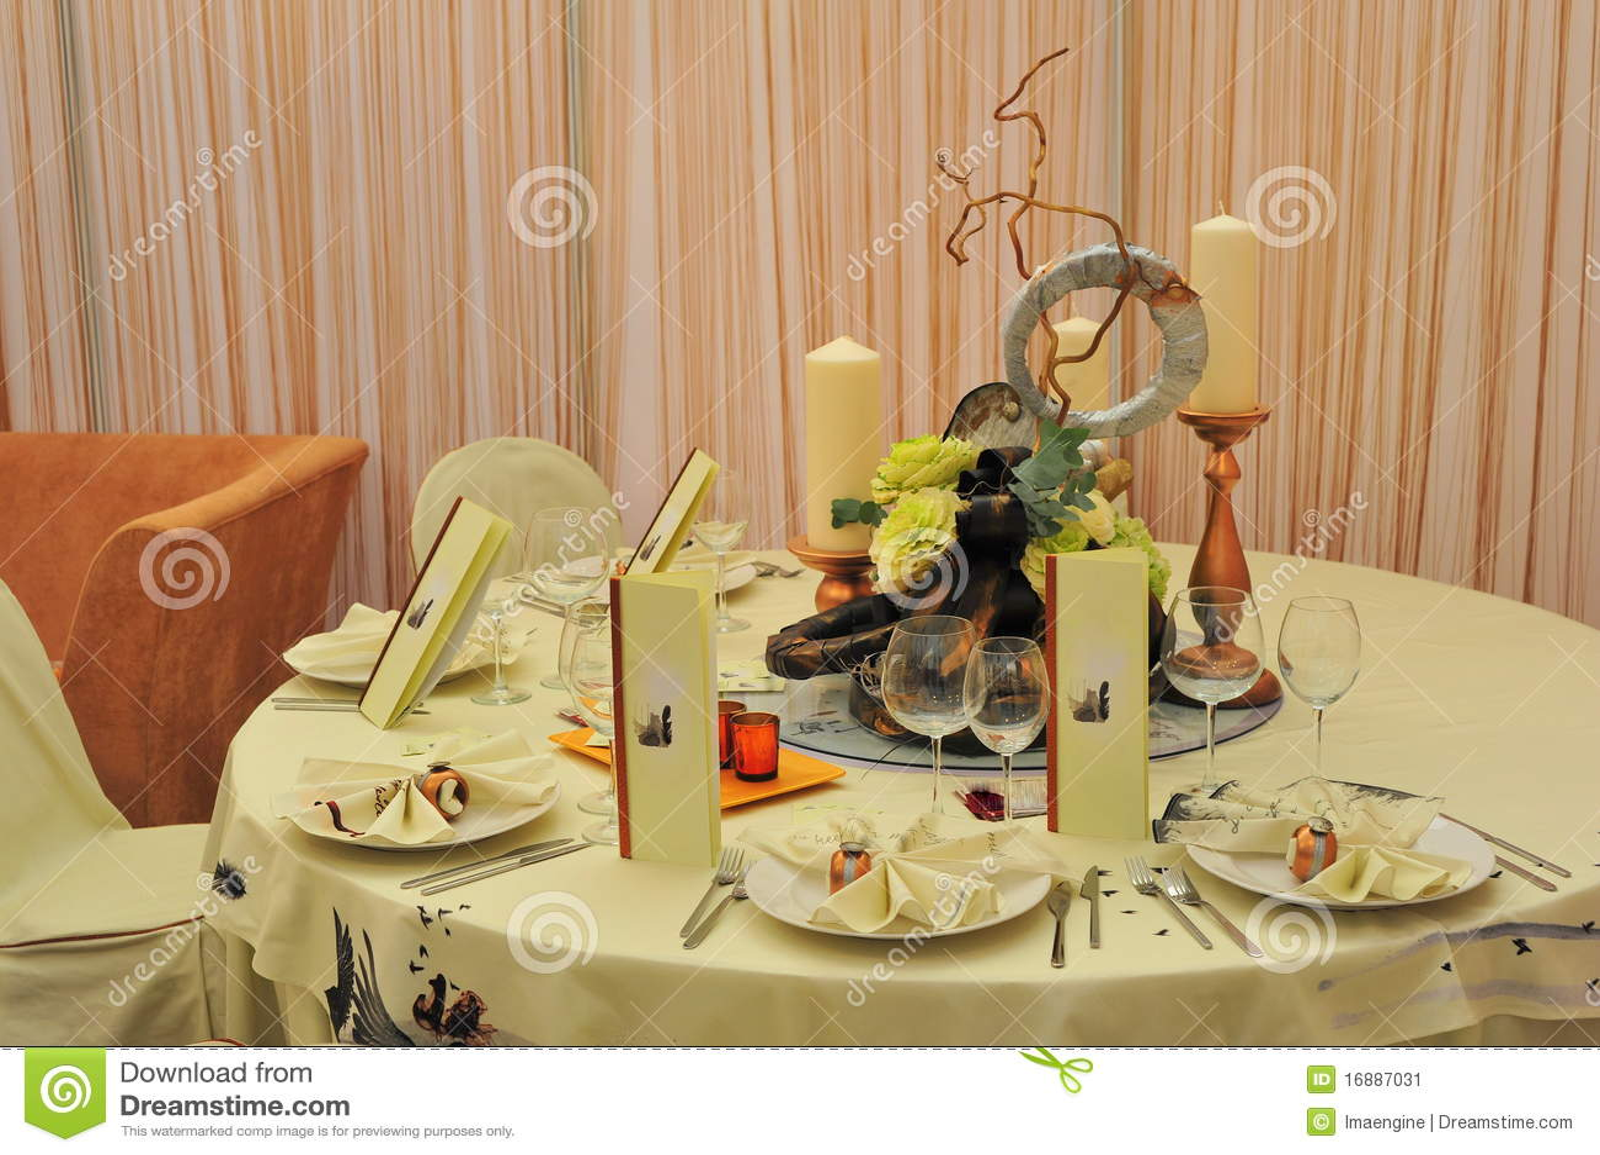 Wedding Reception Table Setting Stock Image